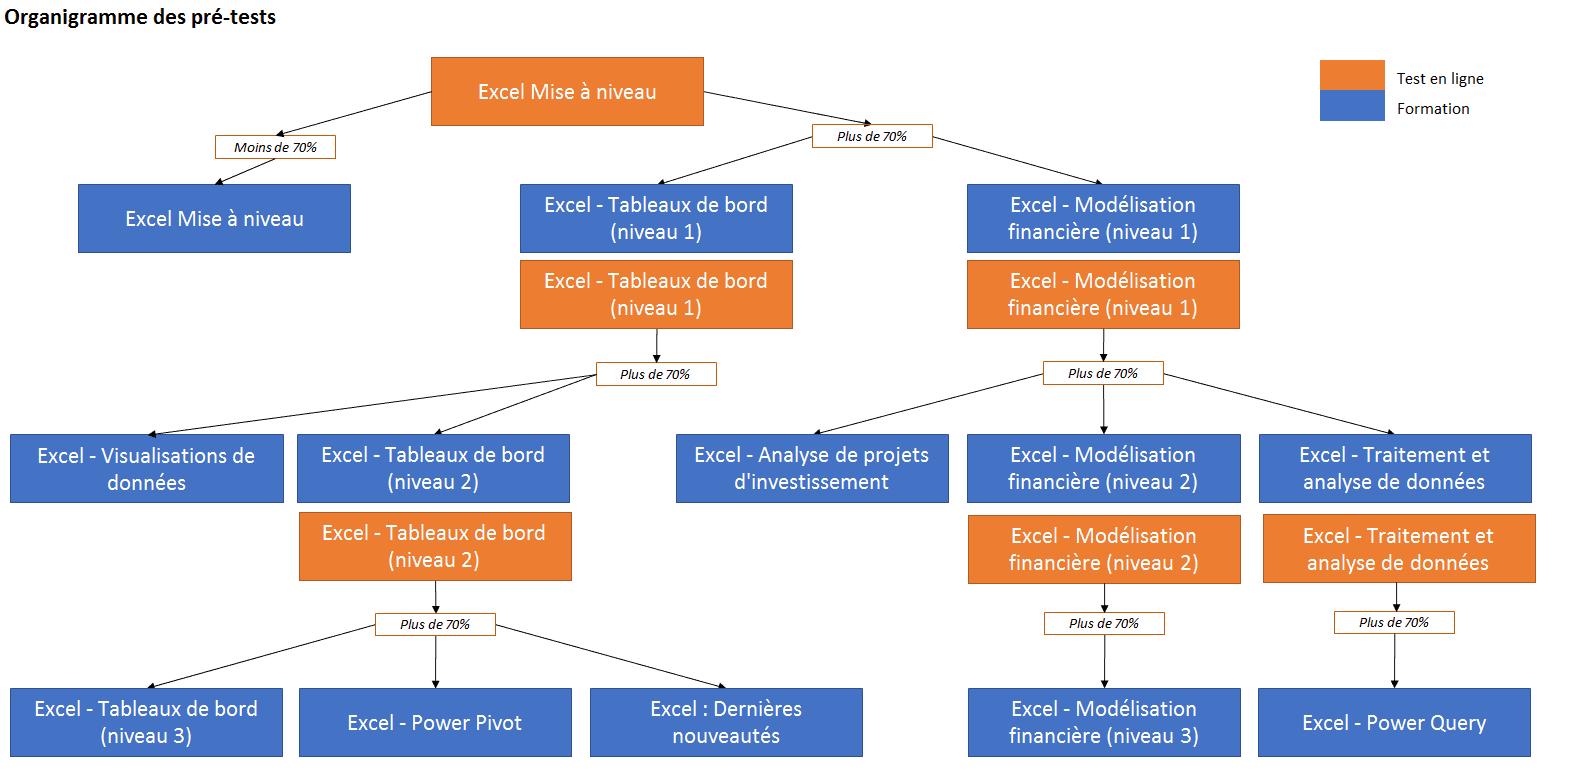 Organigramme pré-tests mai 2017